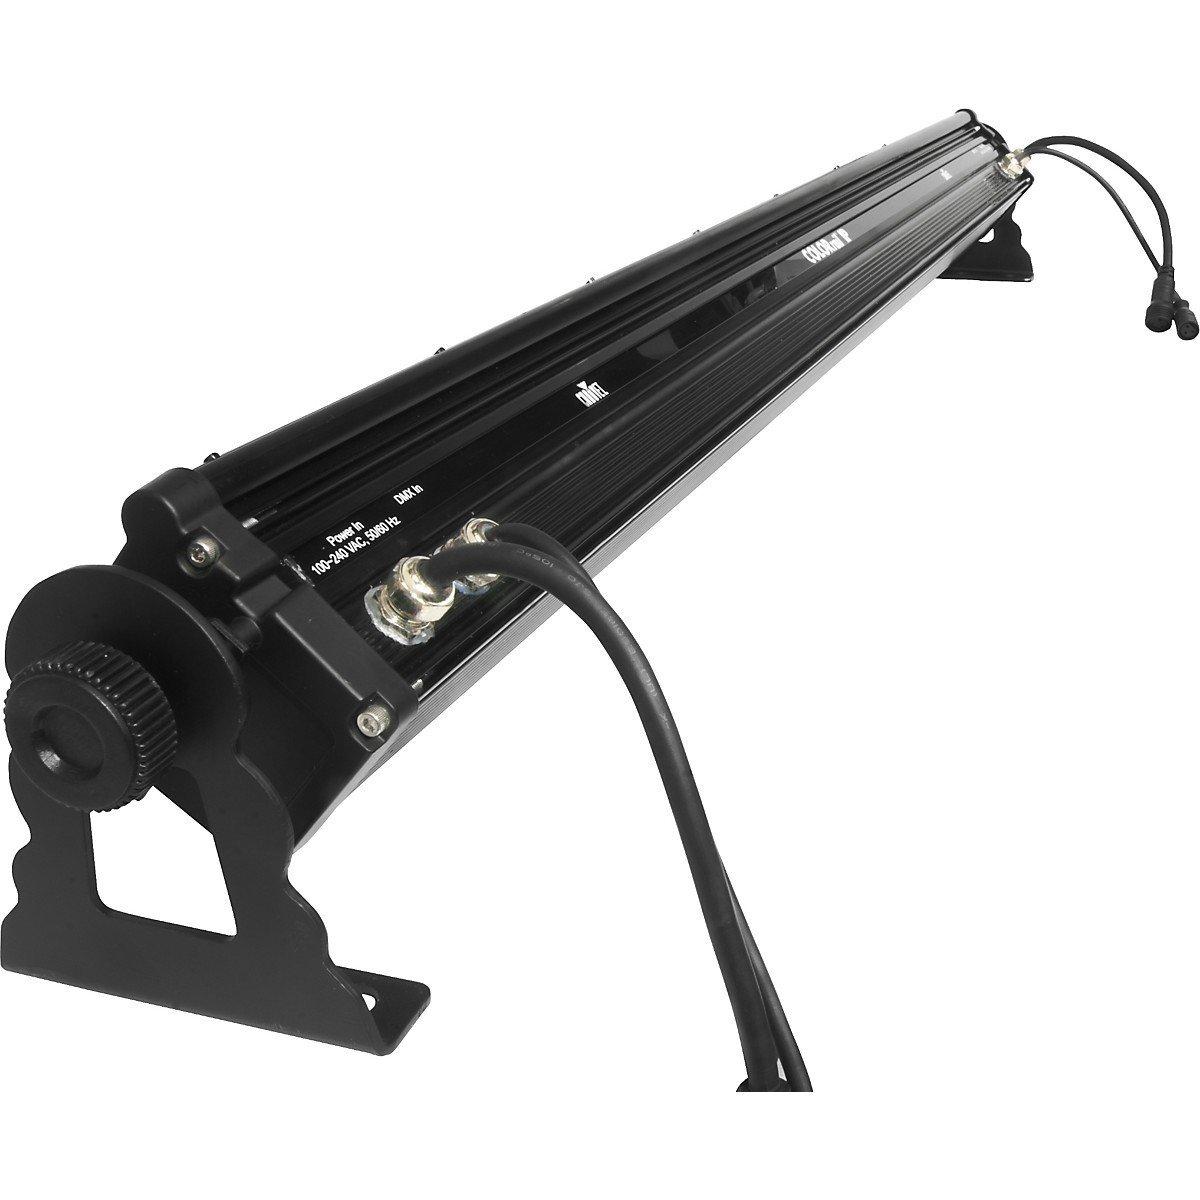 Amazon.com: chauvet color rail irc ip led light effect for outdoor ...